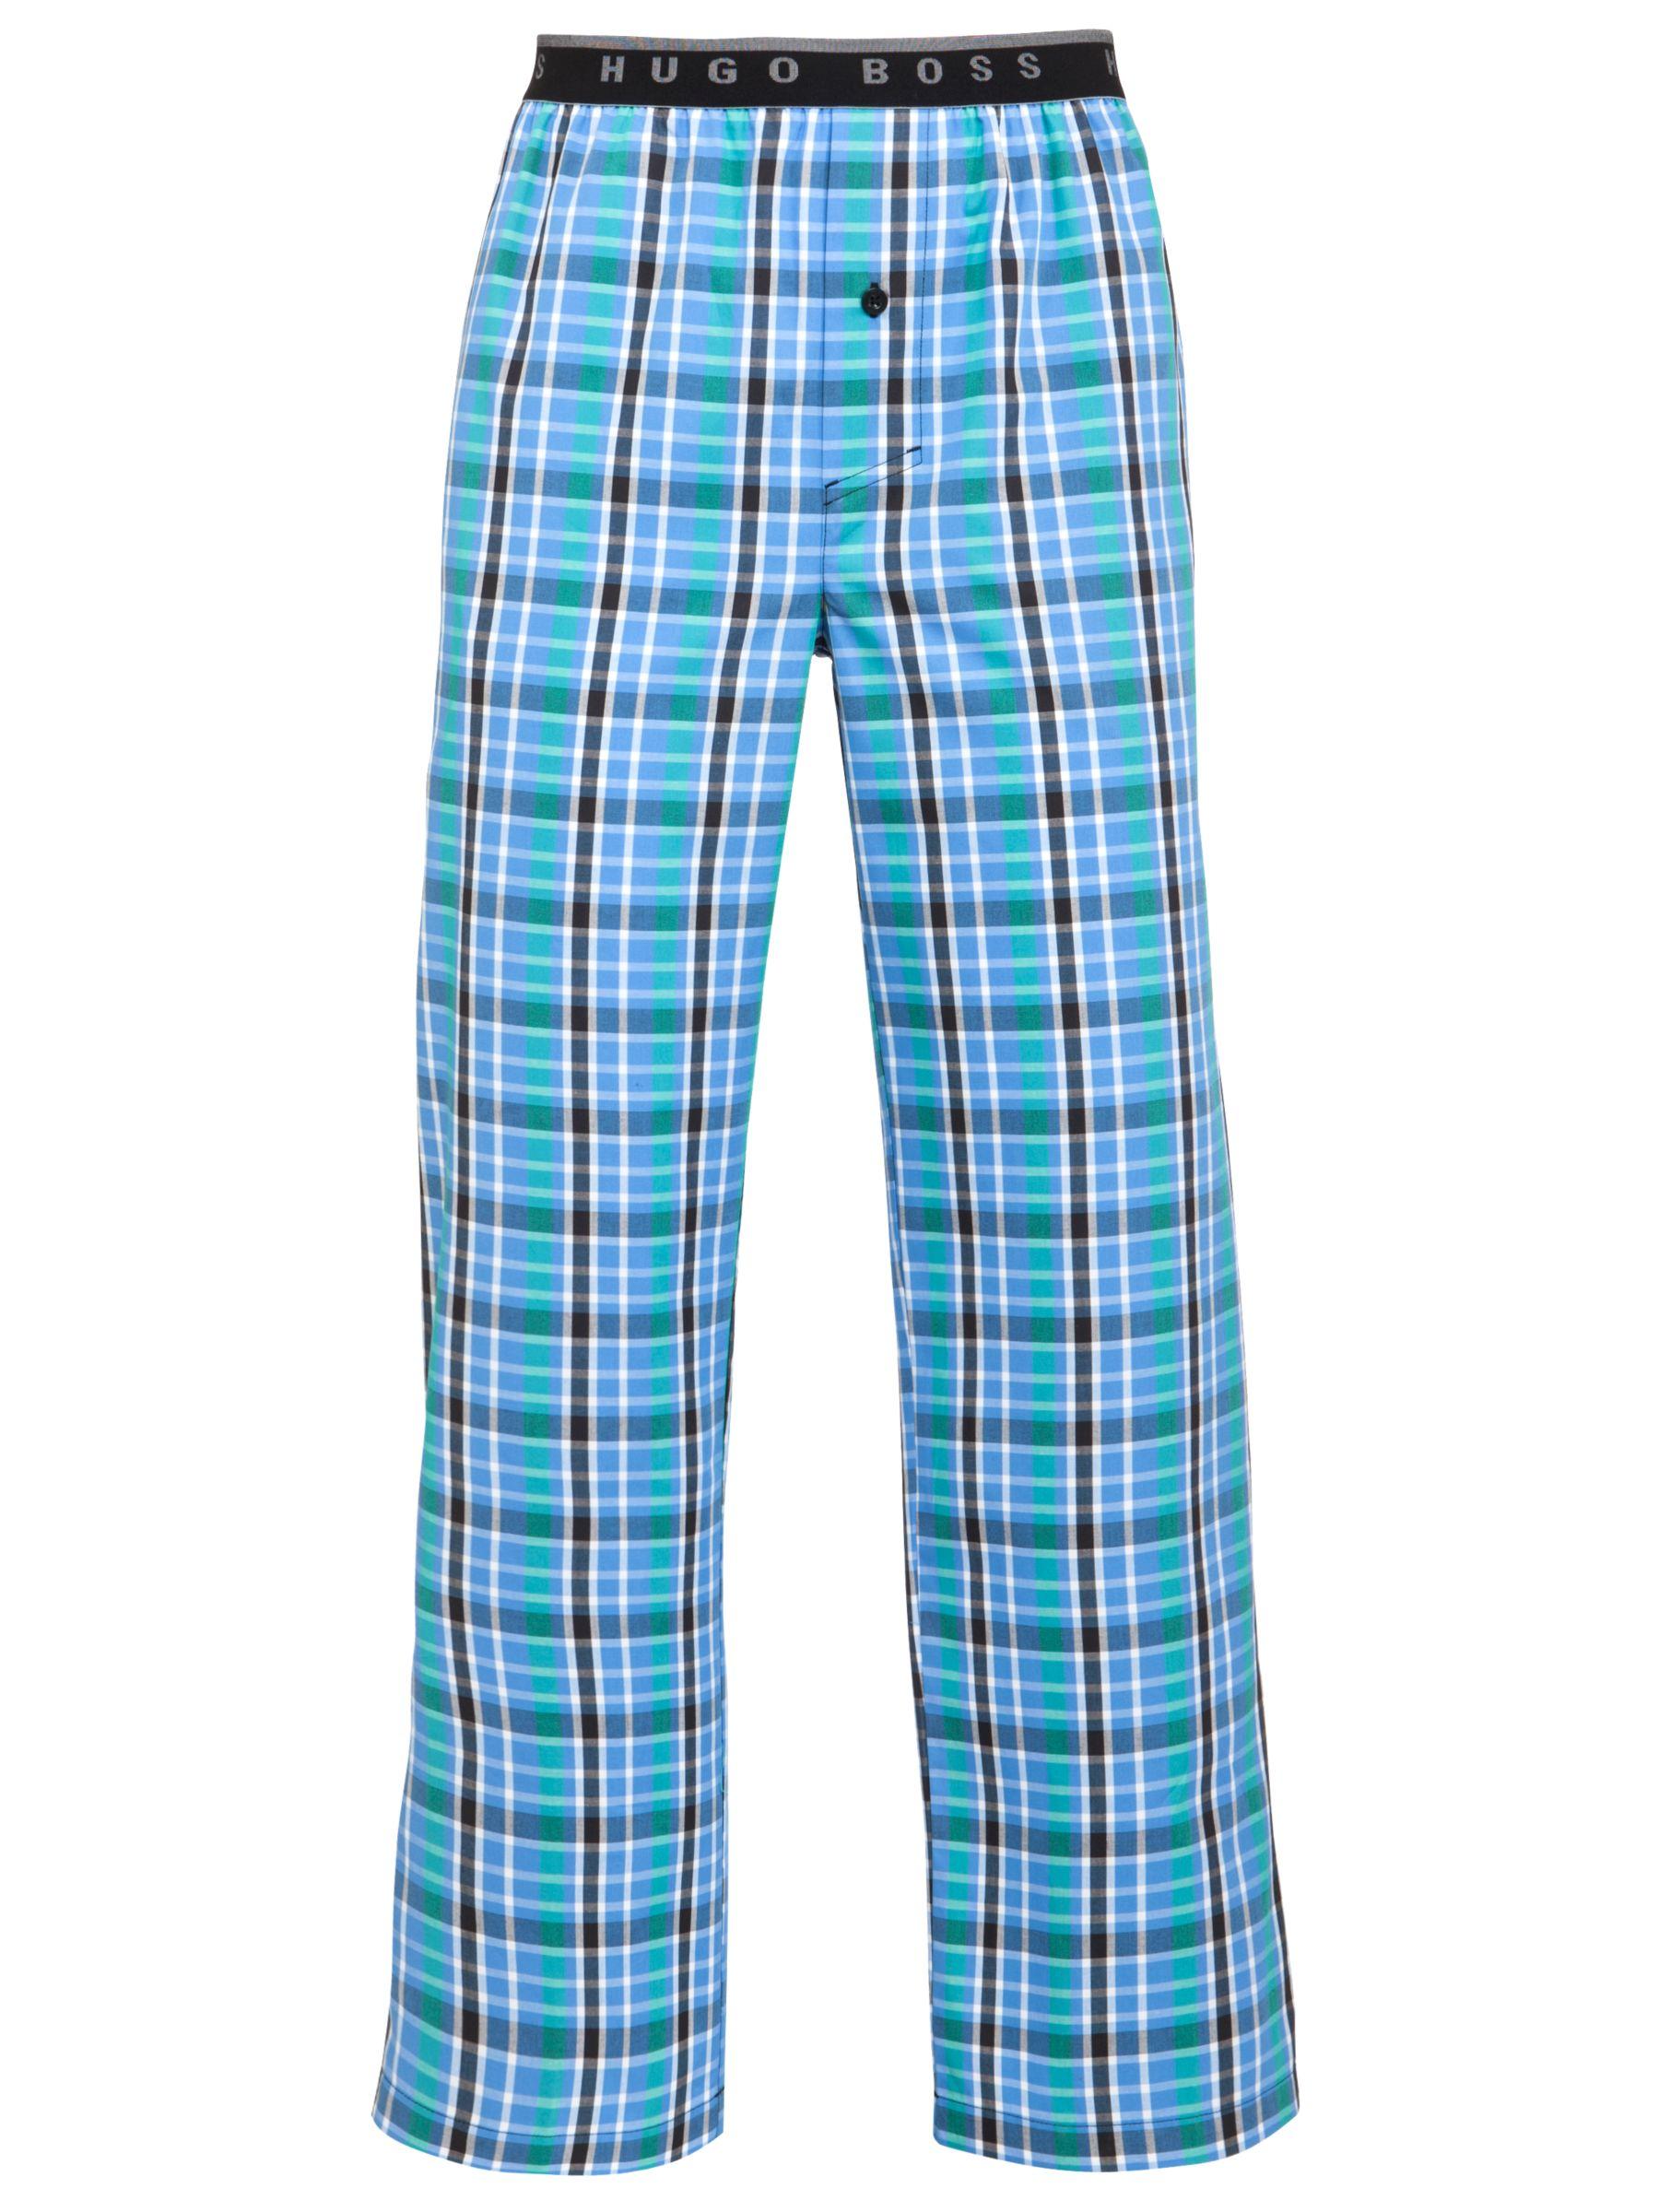 Hugo Boss Check Logo Waist Lounge Pants, Blue